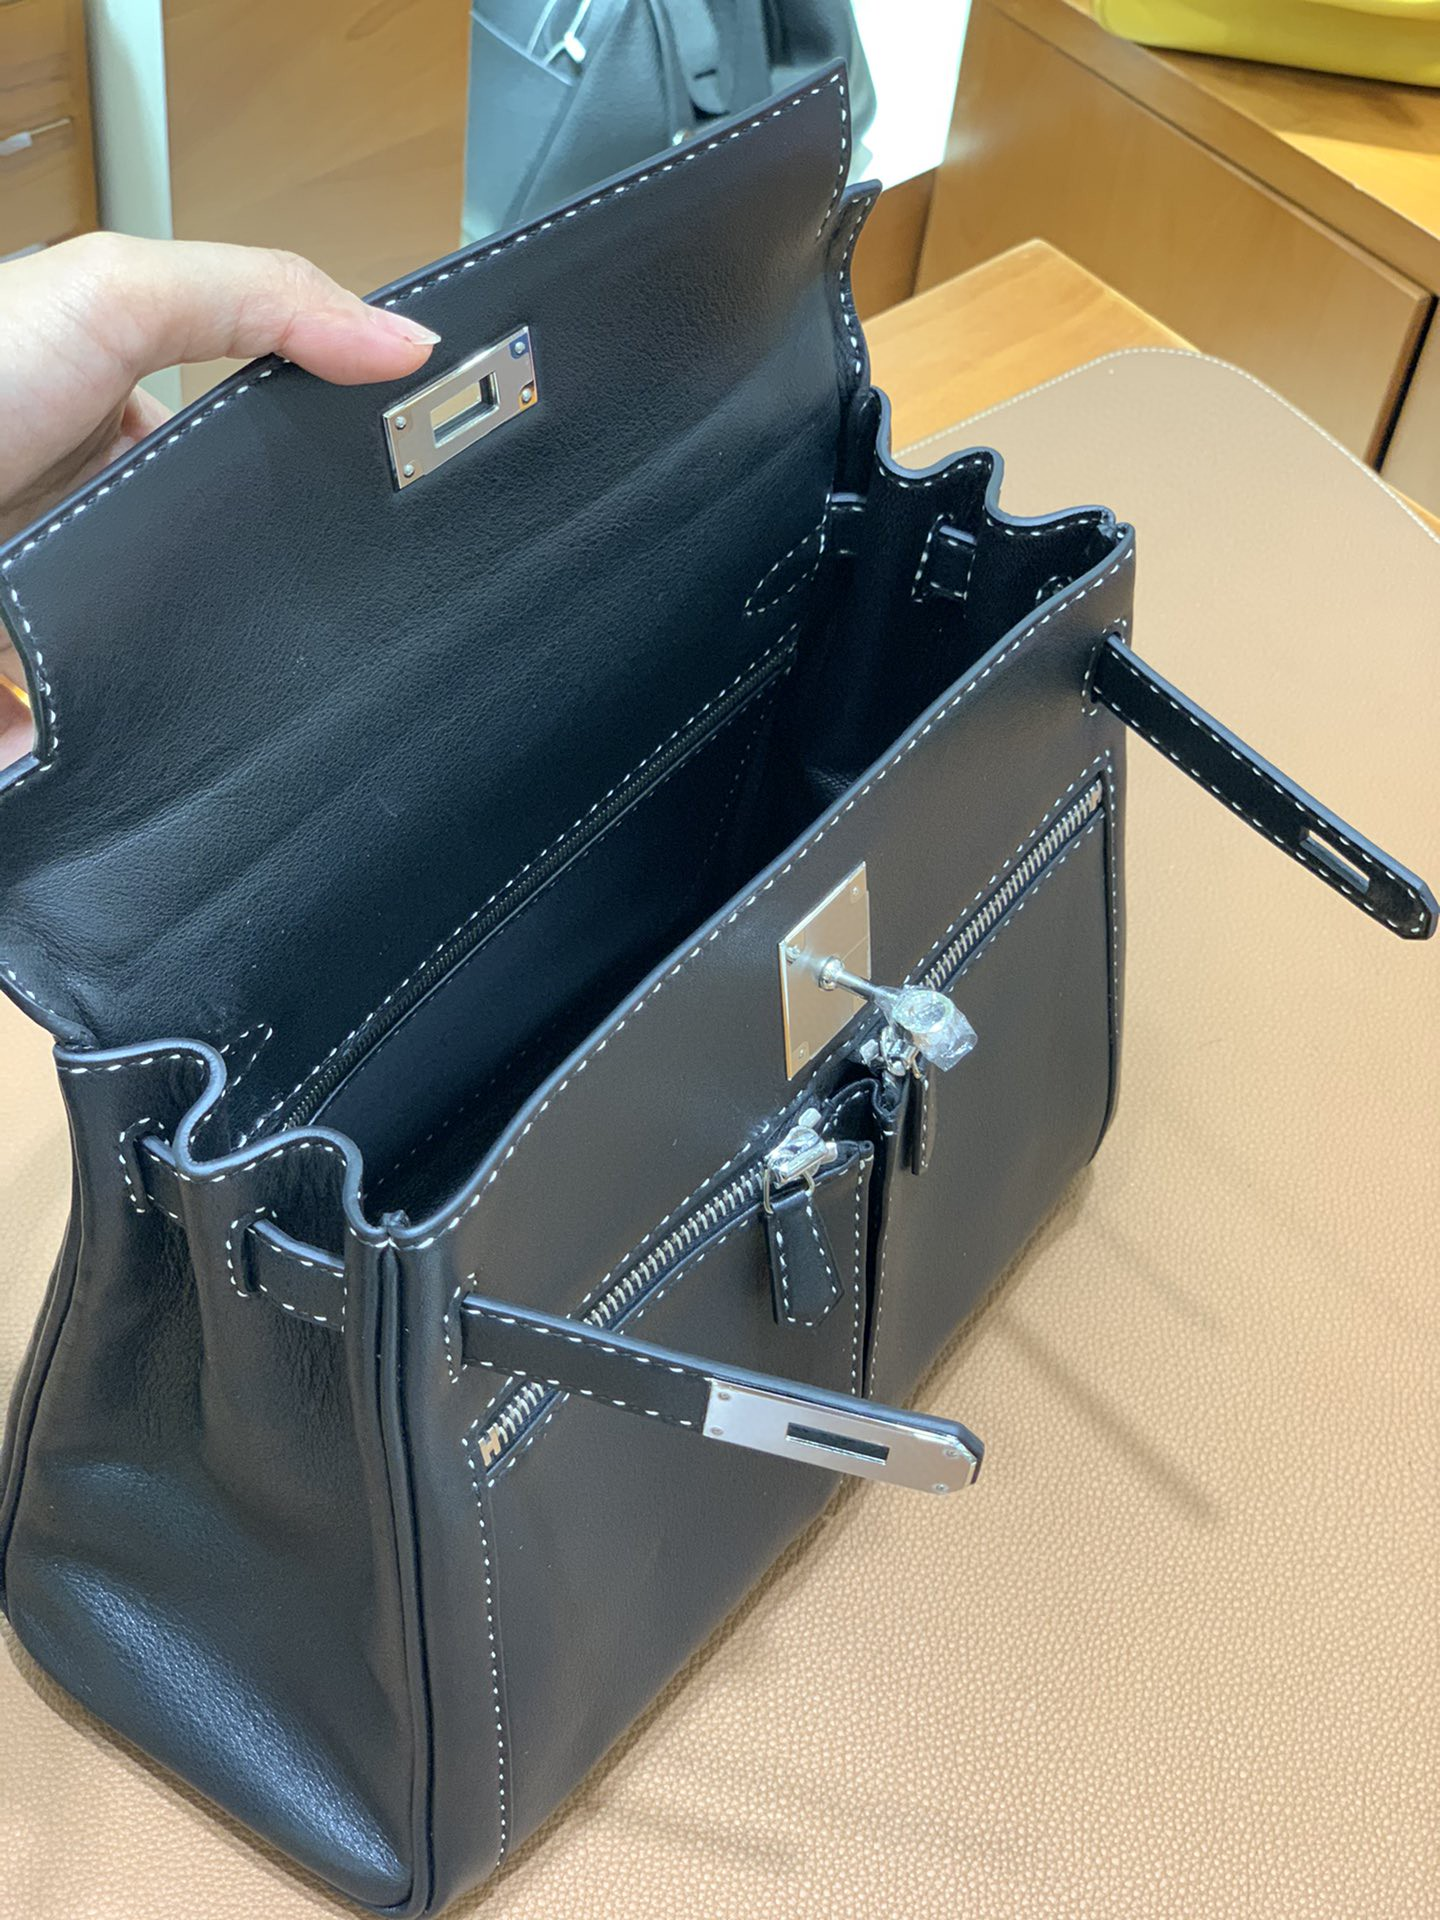 Hermès(爱马仕)Kelly lakis 黑色 swift皮 双色线 银扣 28cm 现货